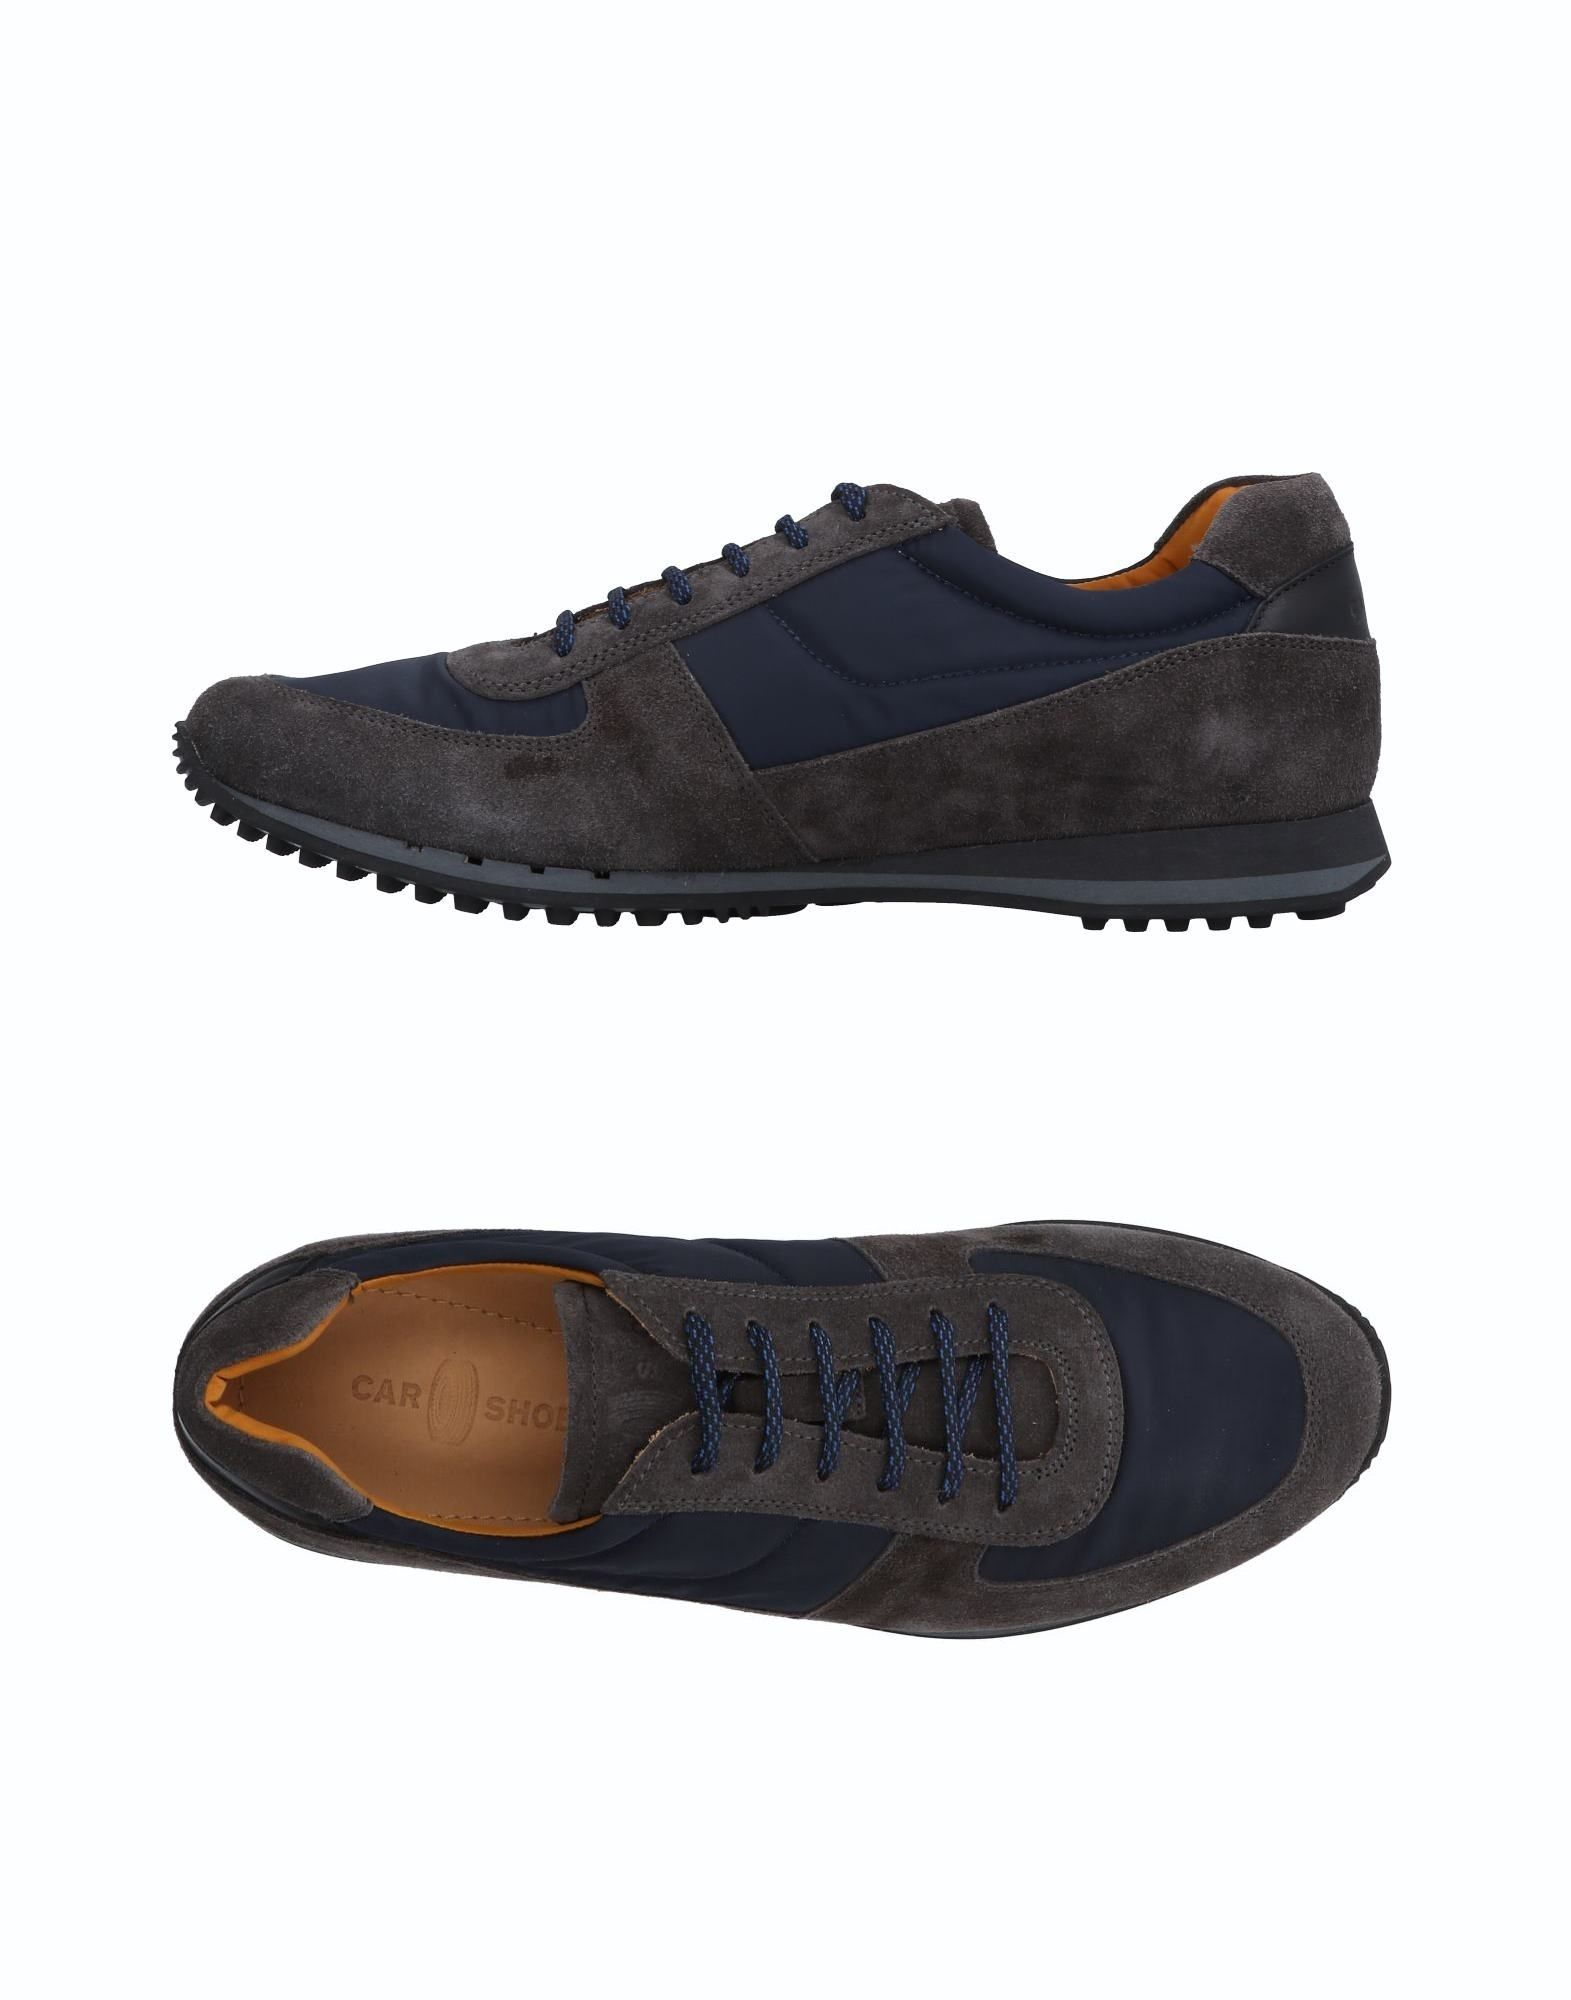 Moda Sneakers Carshoe Uomo - 11501988XN